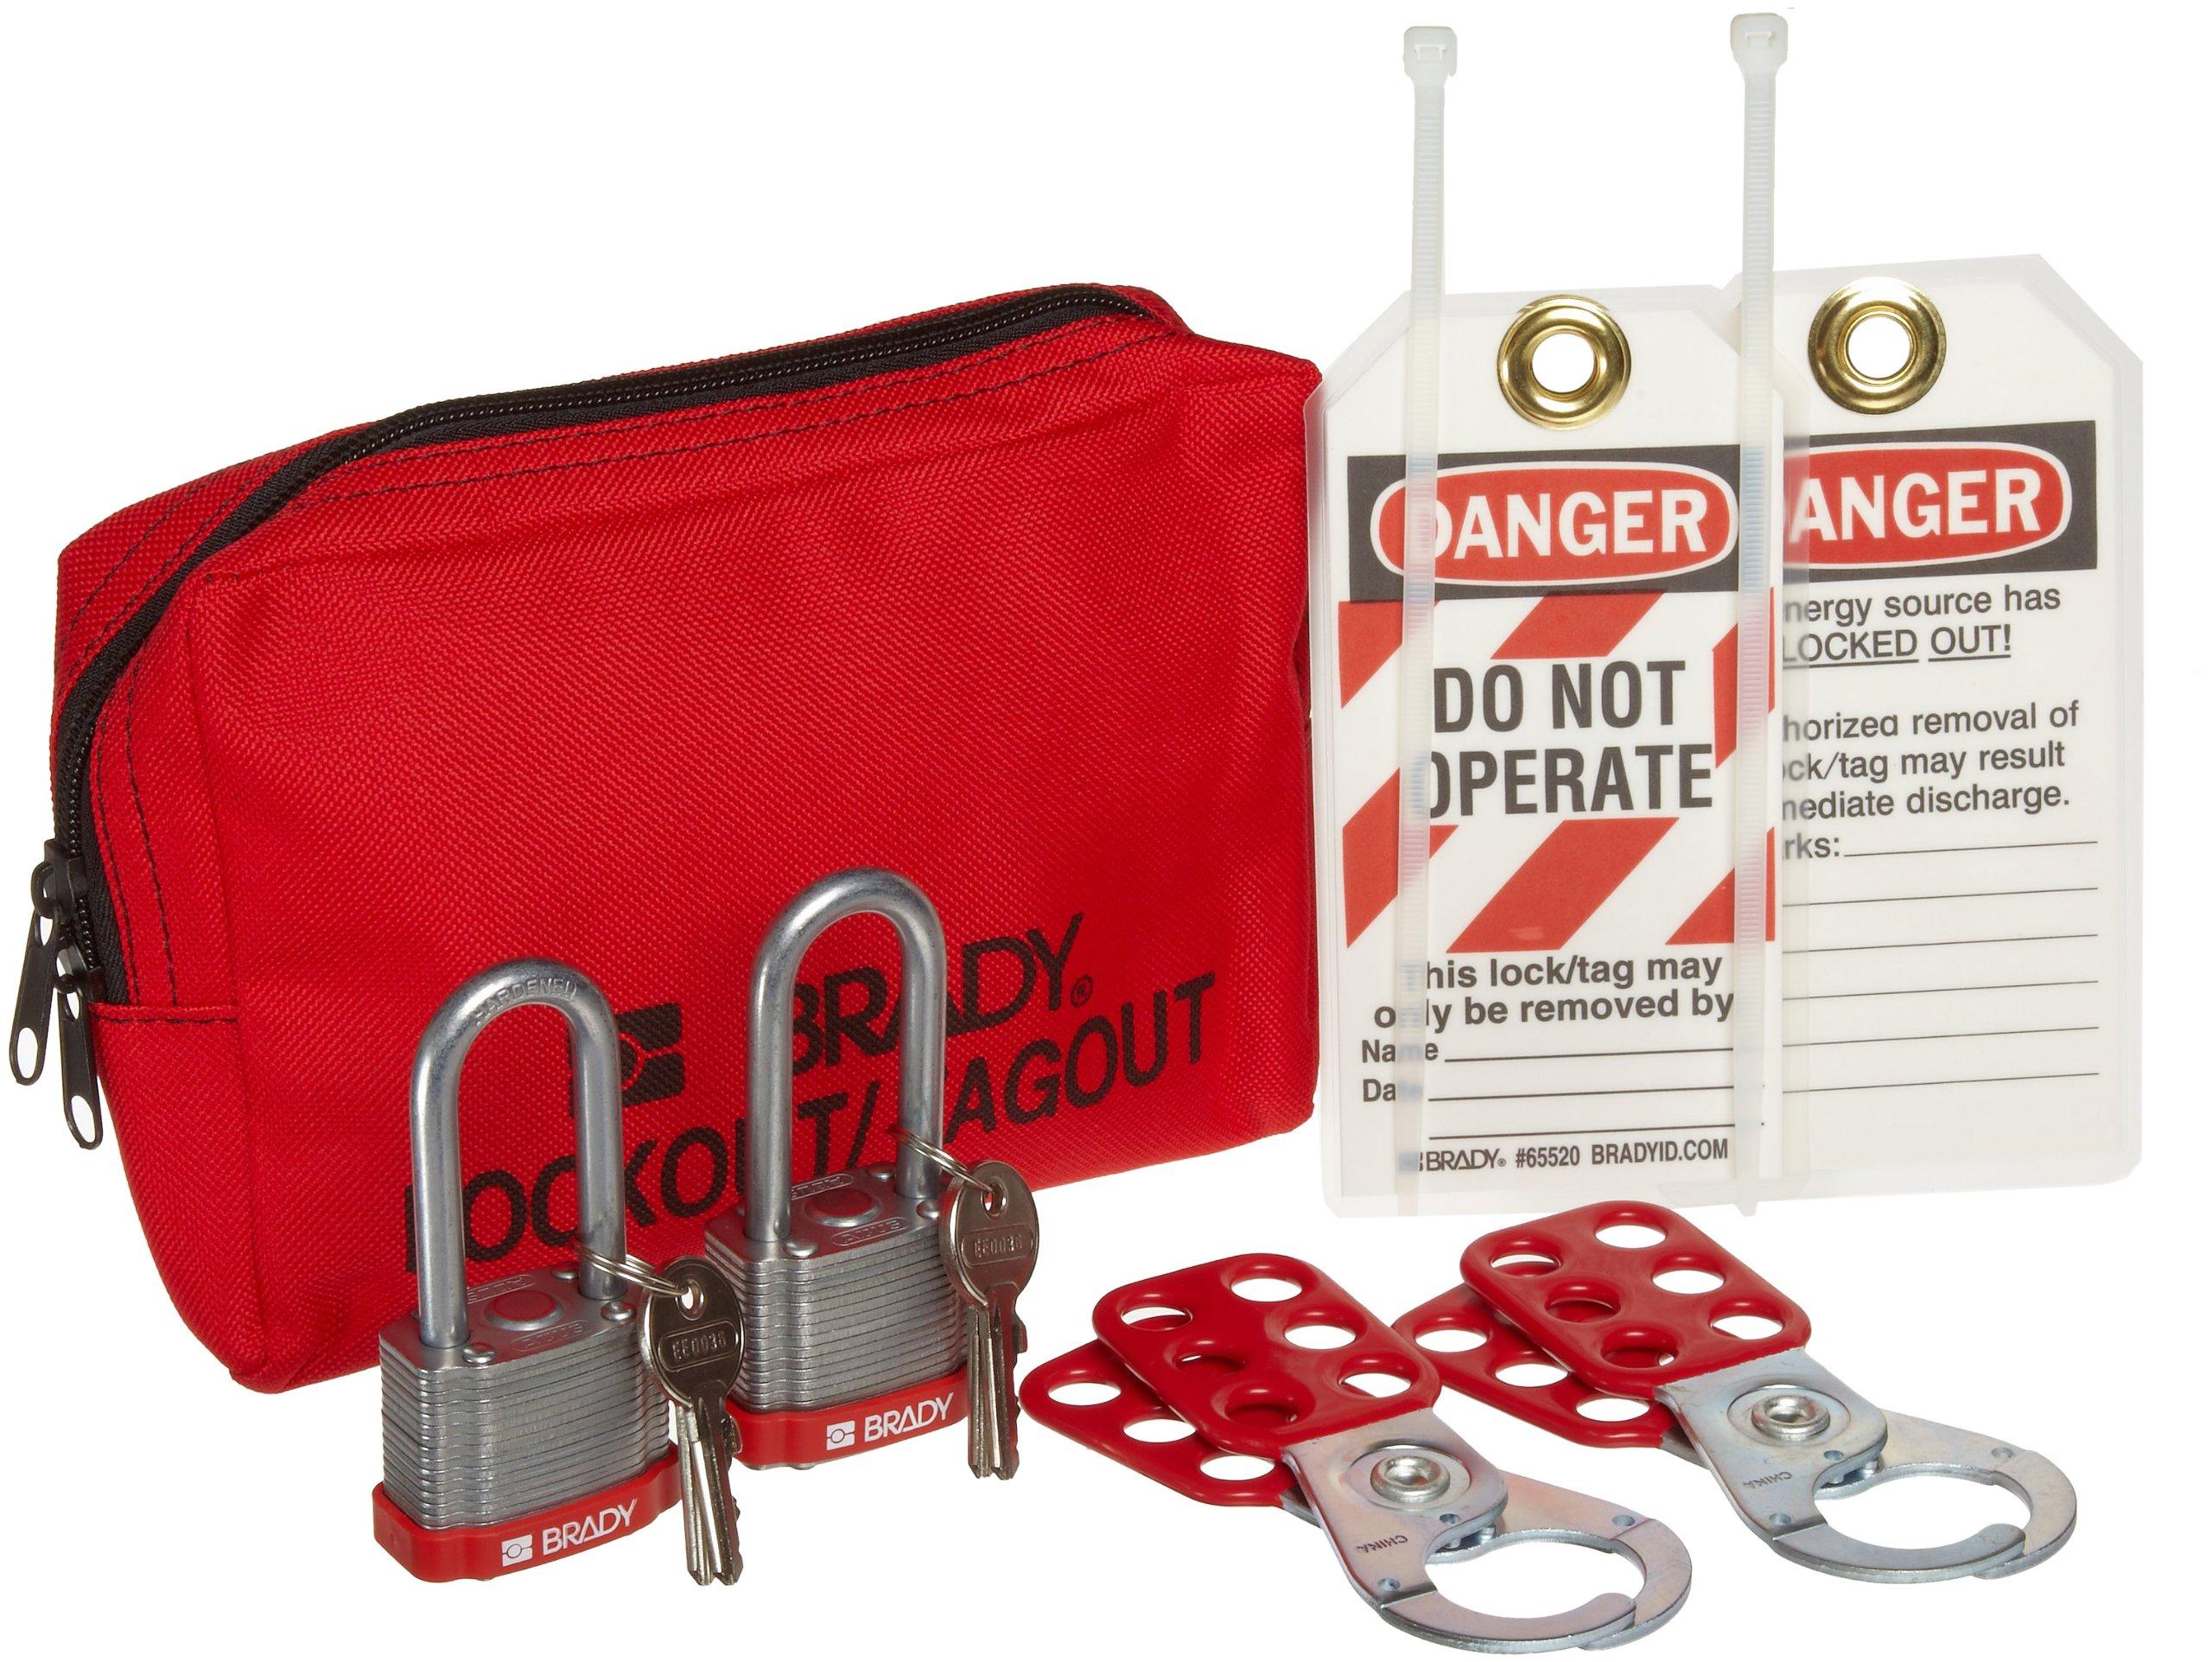 Brady Personal Lockout Pouch Kit, Includes 2 Steel Padlocks